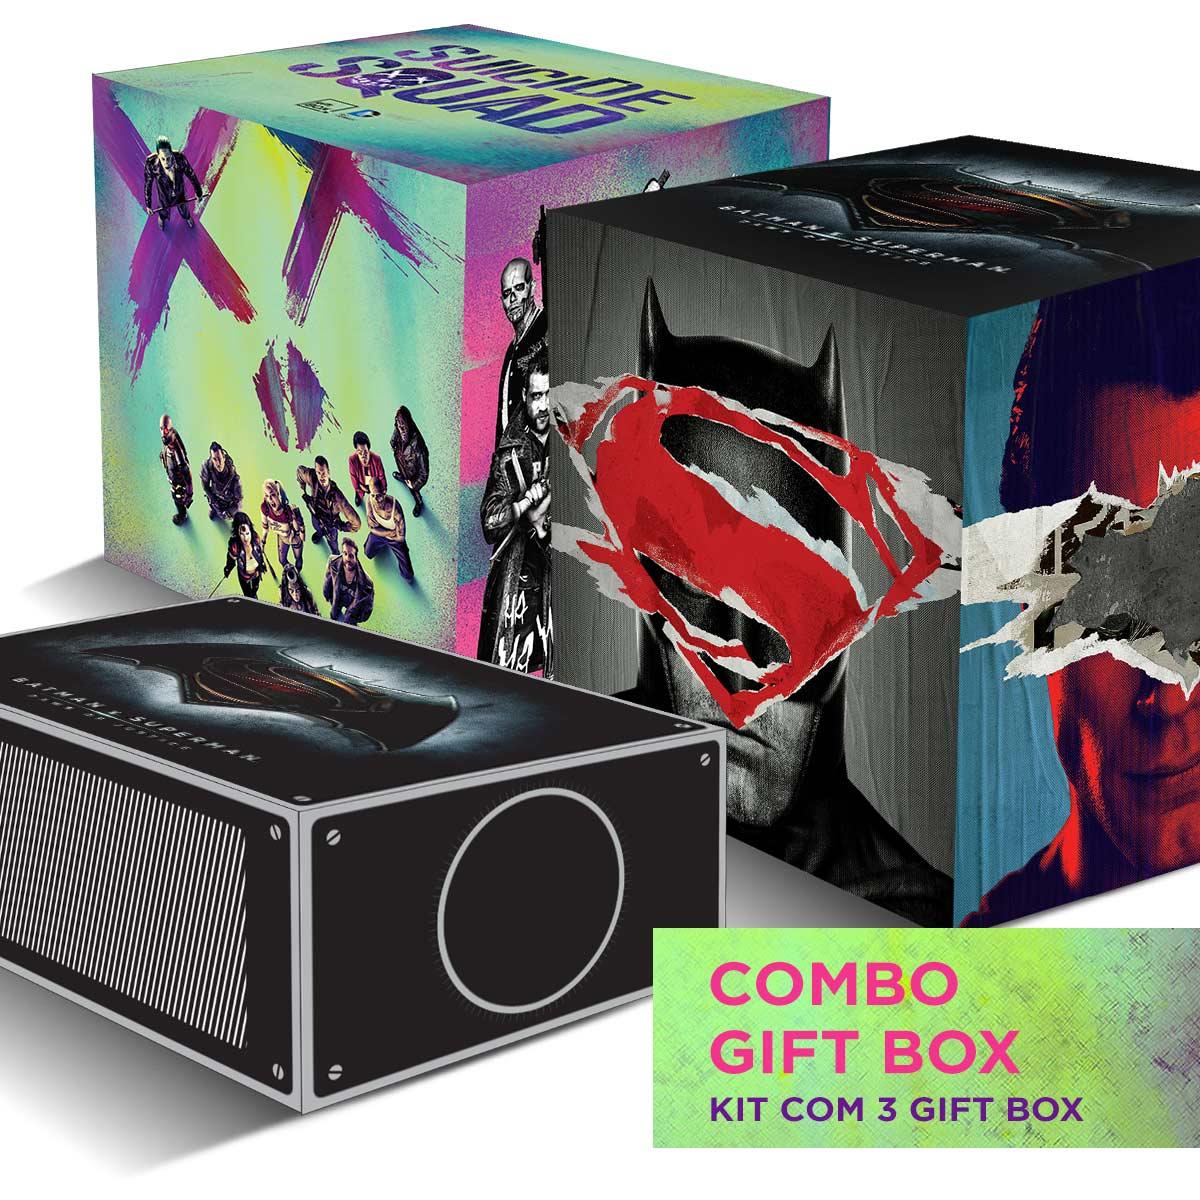 KIT 3 GIFT BOX MERCADO LIVRE  - bandUP Store Marketplace